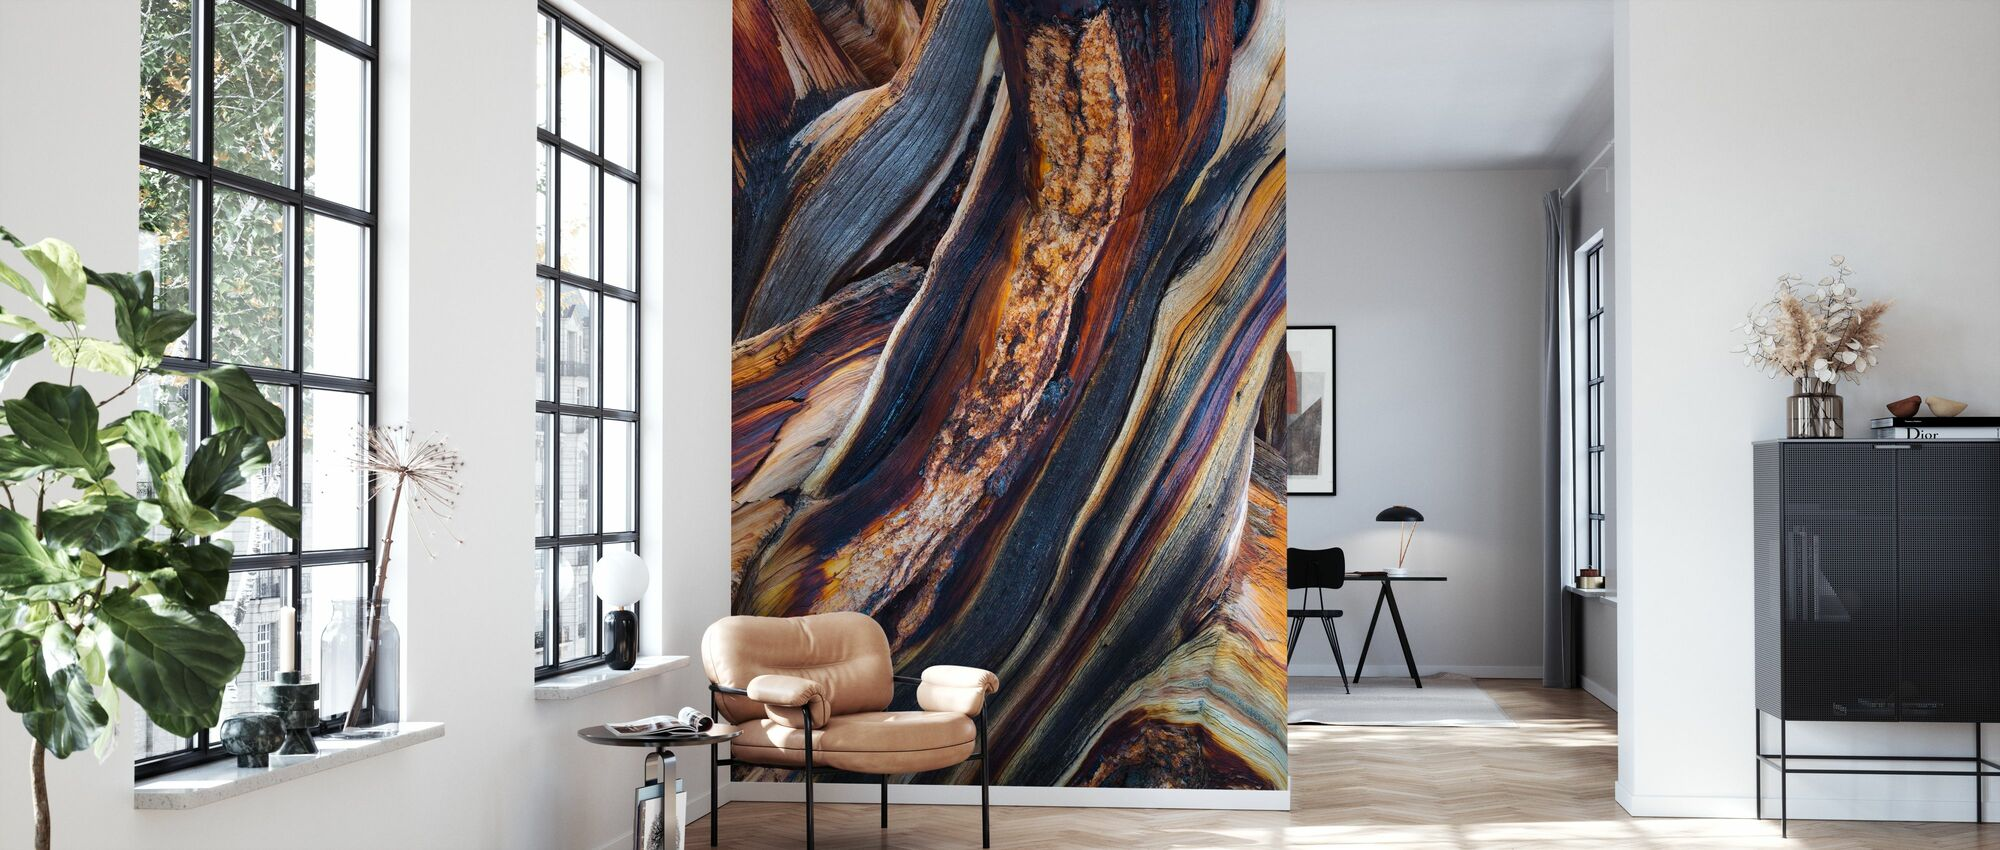 Bristlecone Pine, White Mountains, California - Wallpaper - Living Room